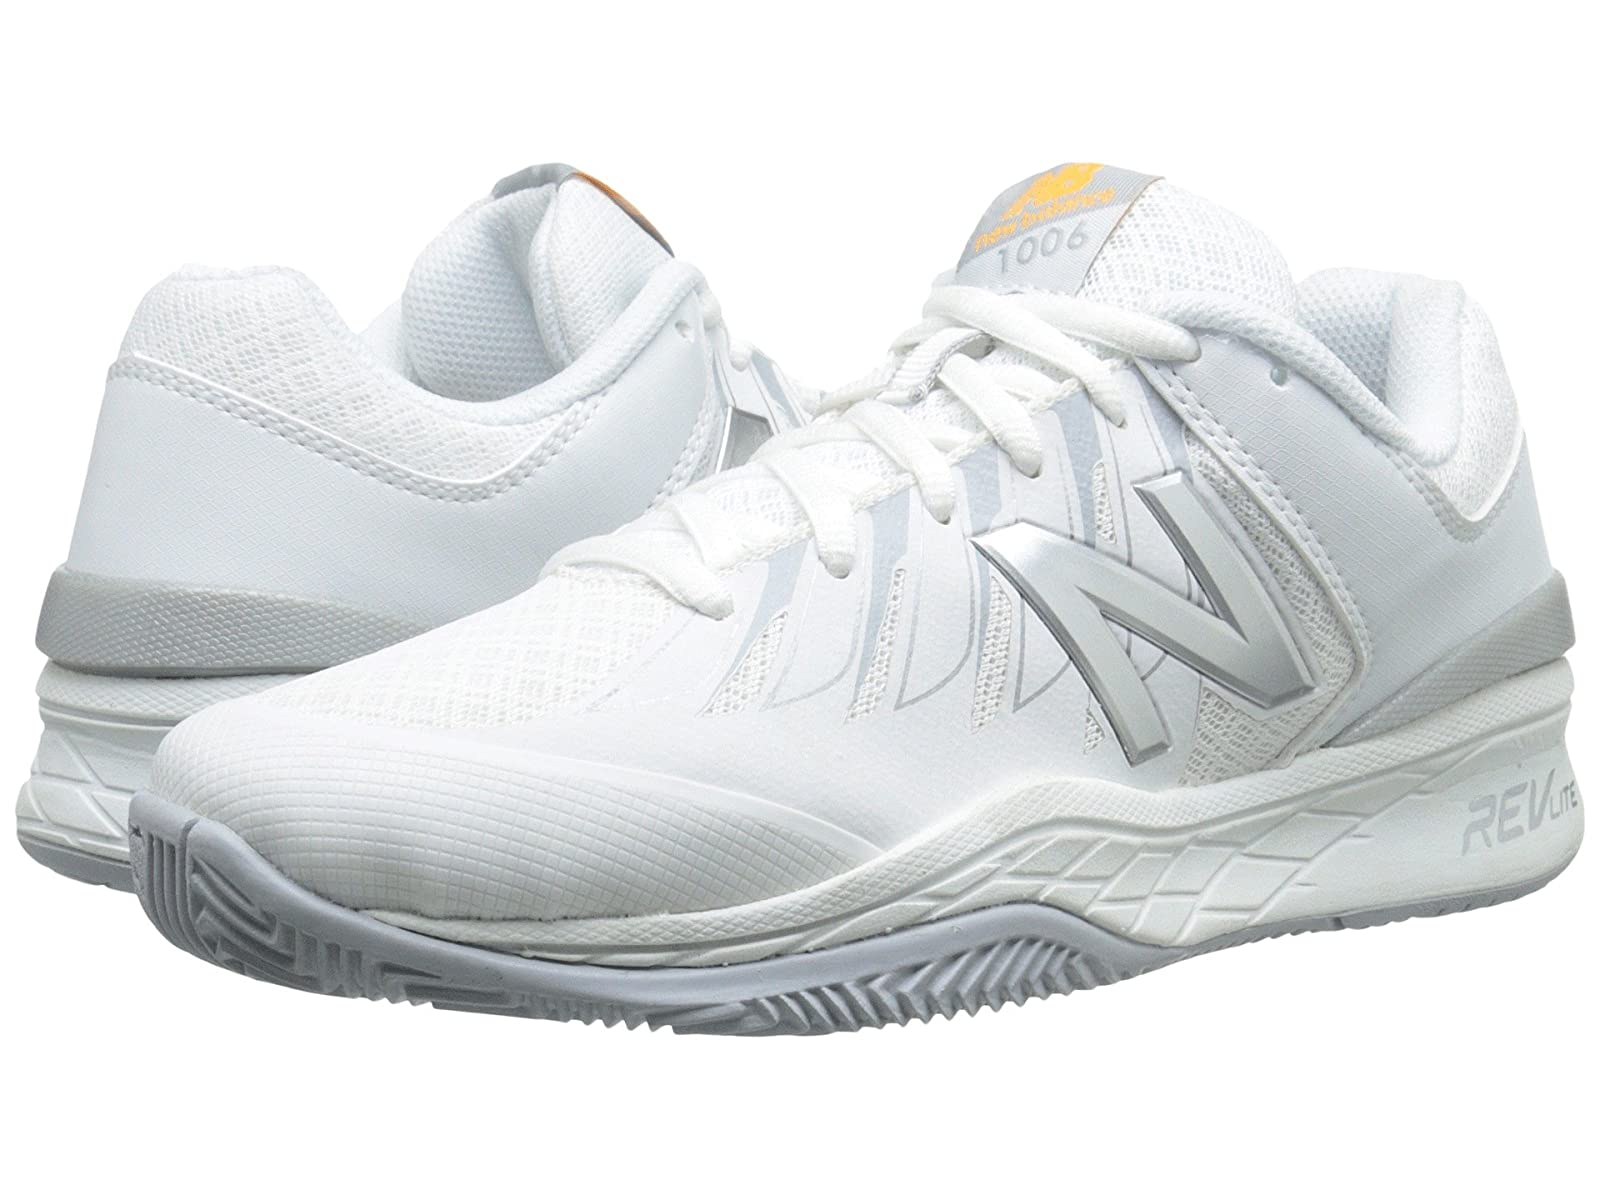 New Balance WC1006v1Atmospheric grades have affordable shoes